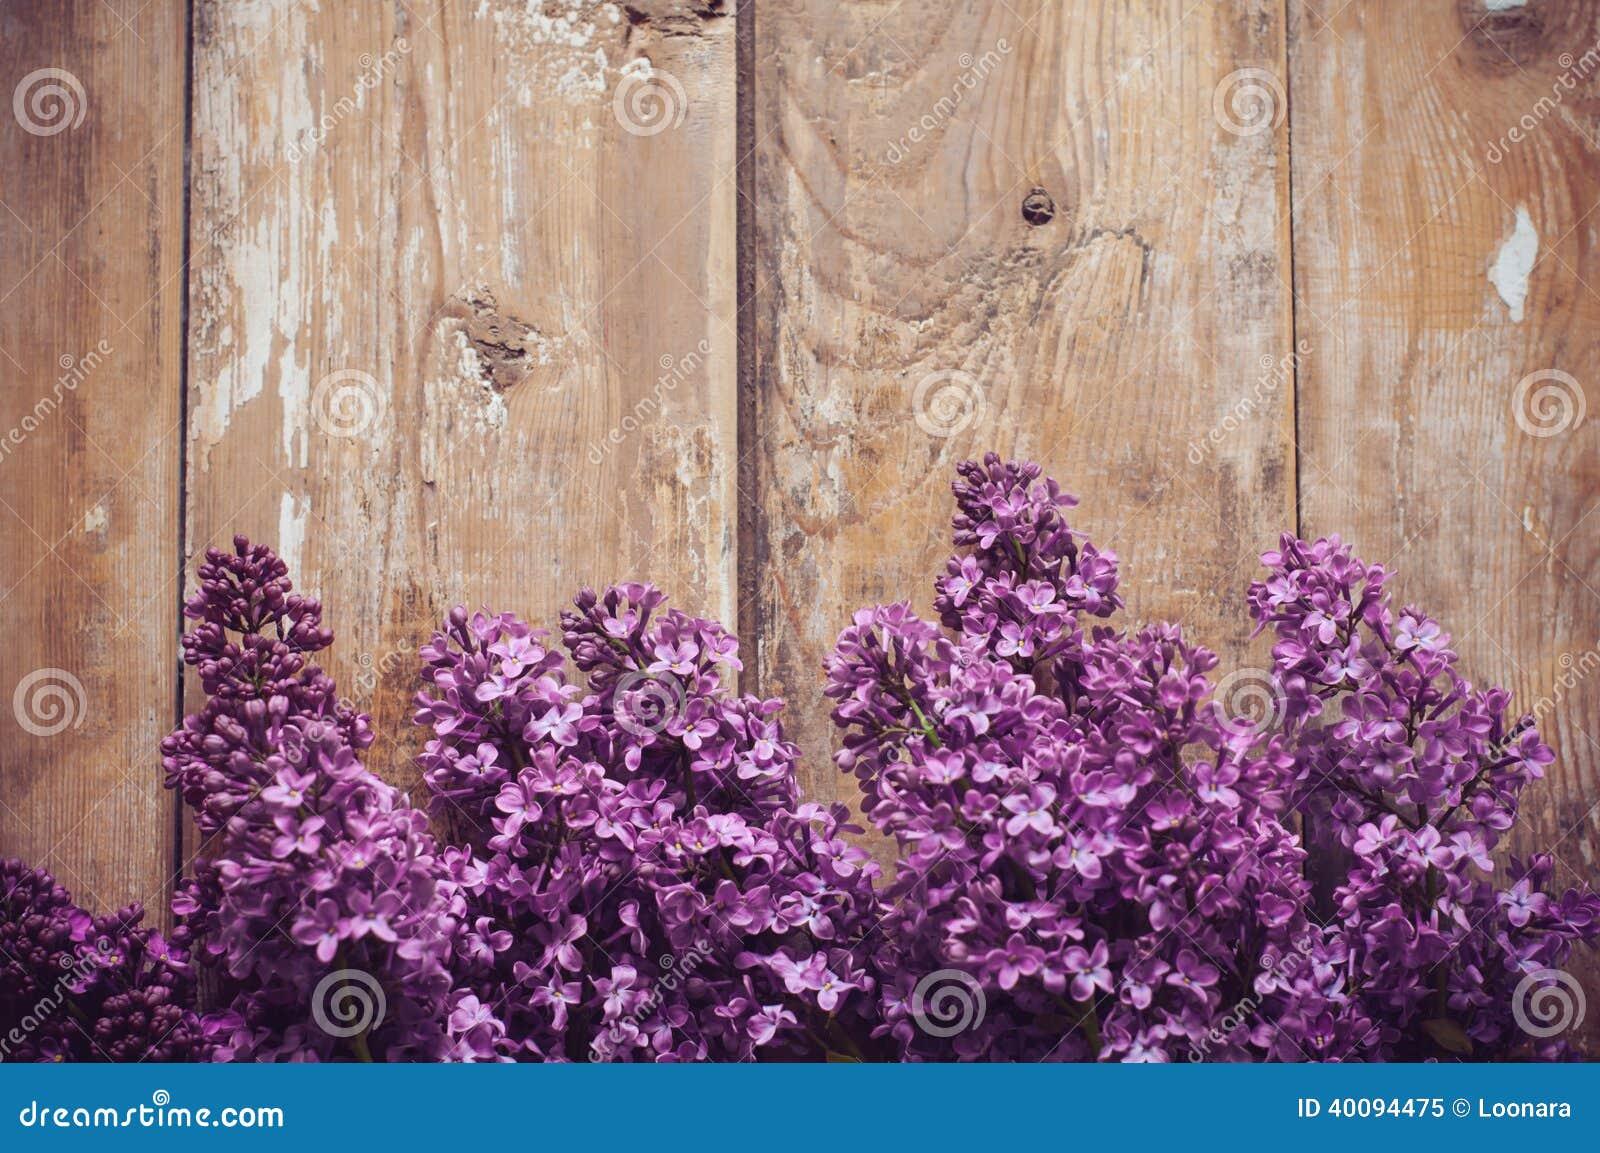 Lilac Flowers Background Stock Photo Image 40094475